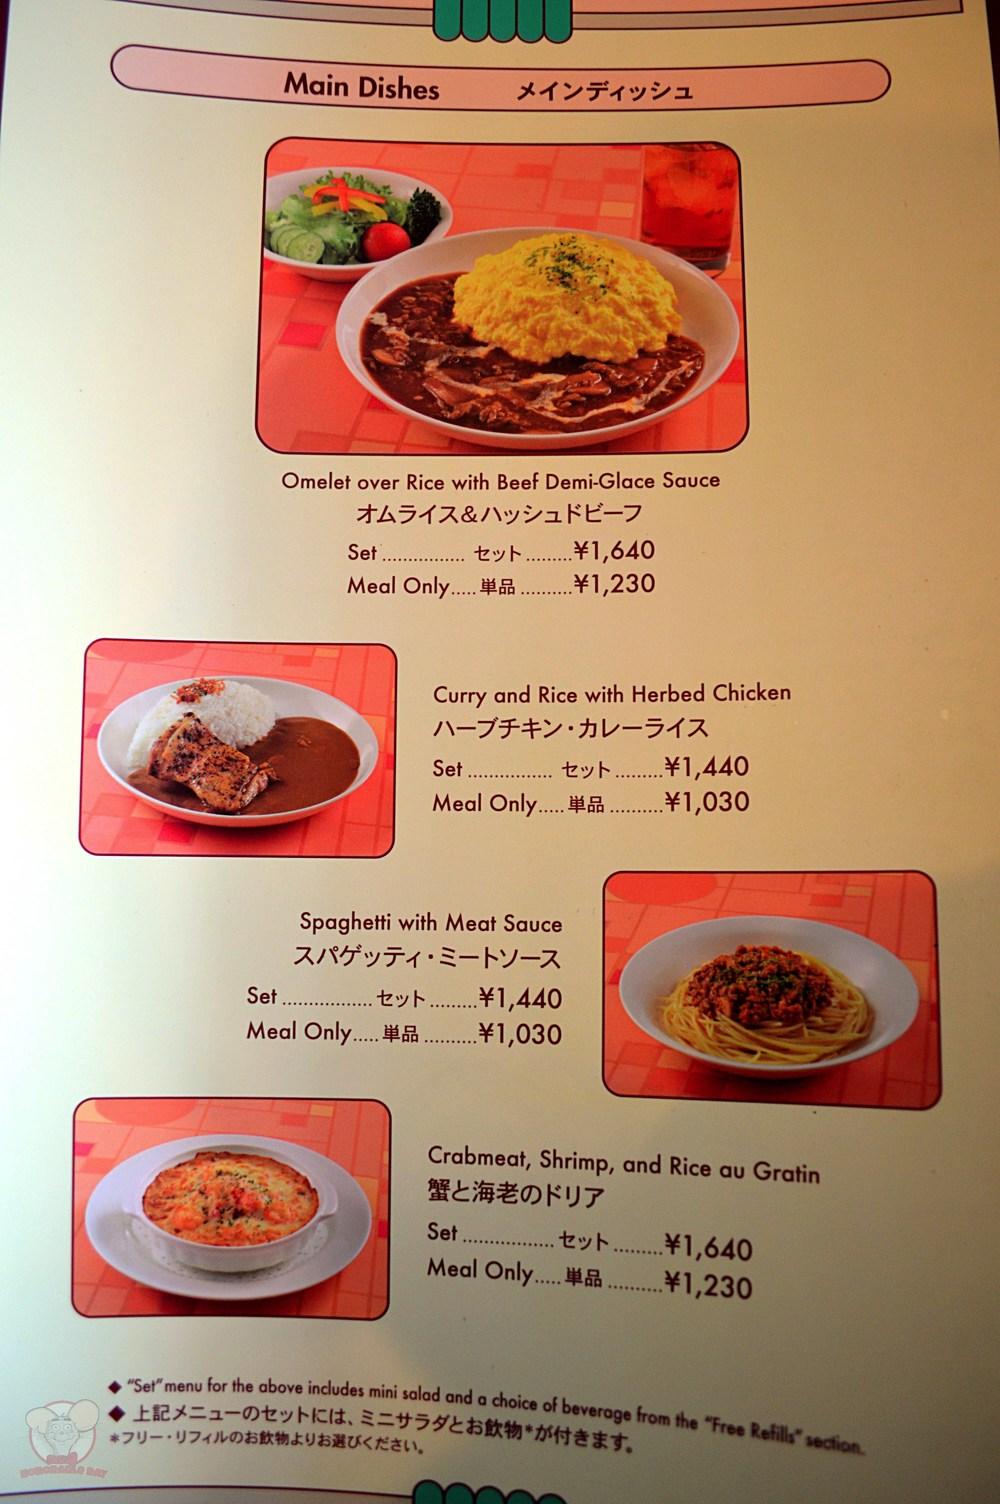 Center Street Coffeehouse Menu, Main Dishes (A)